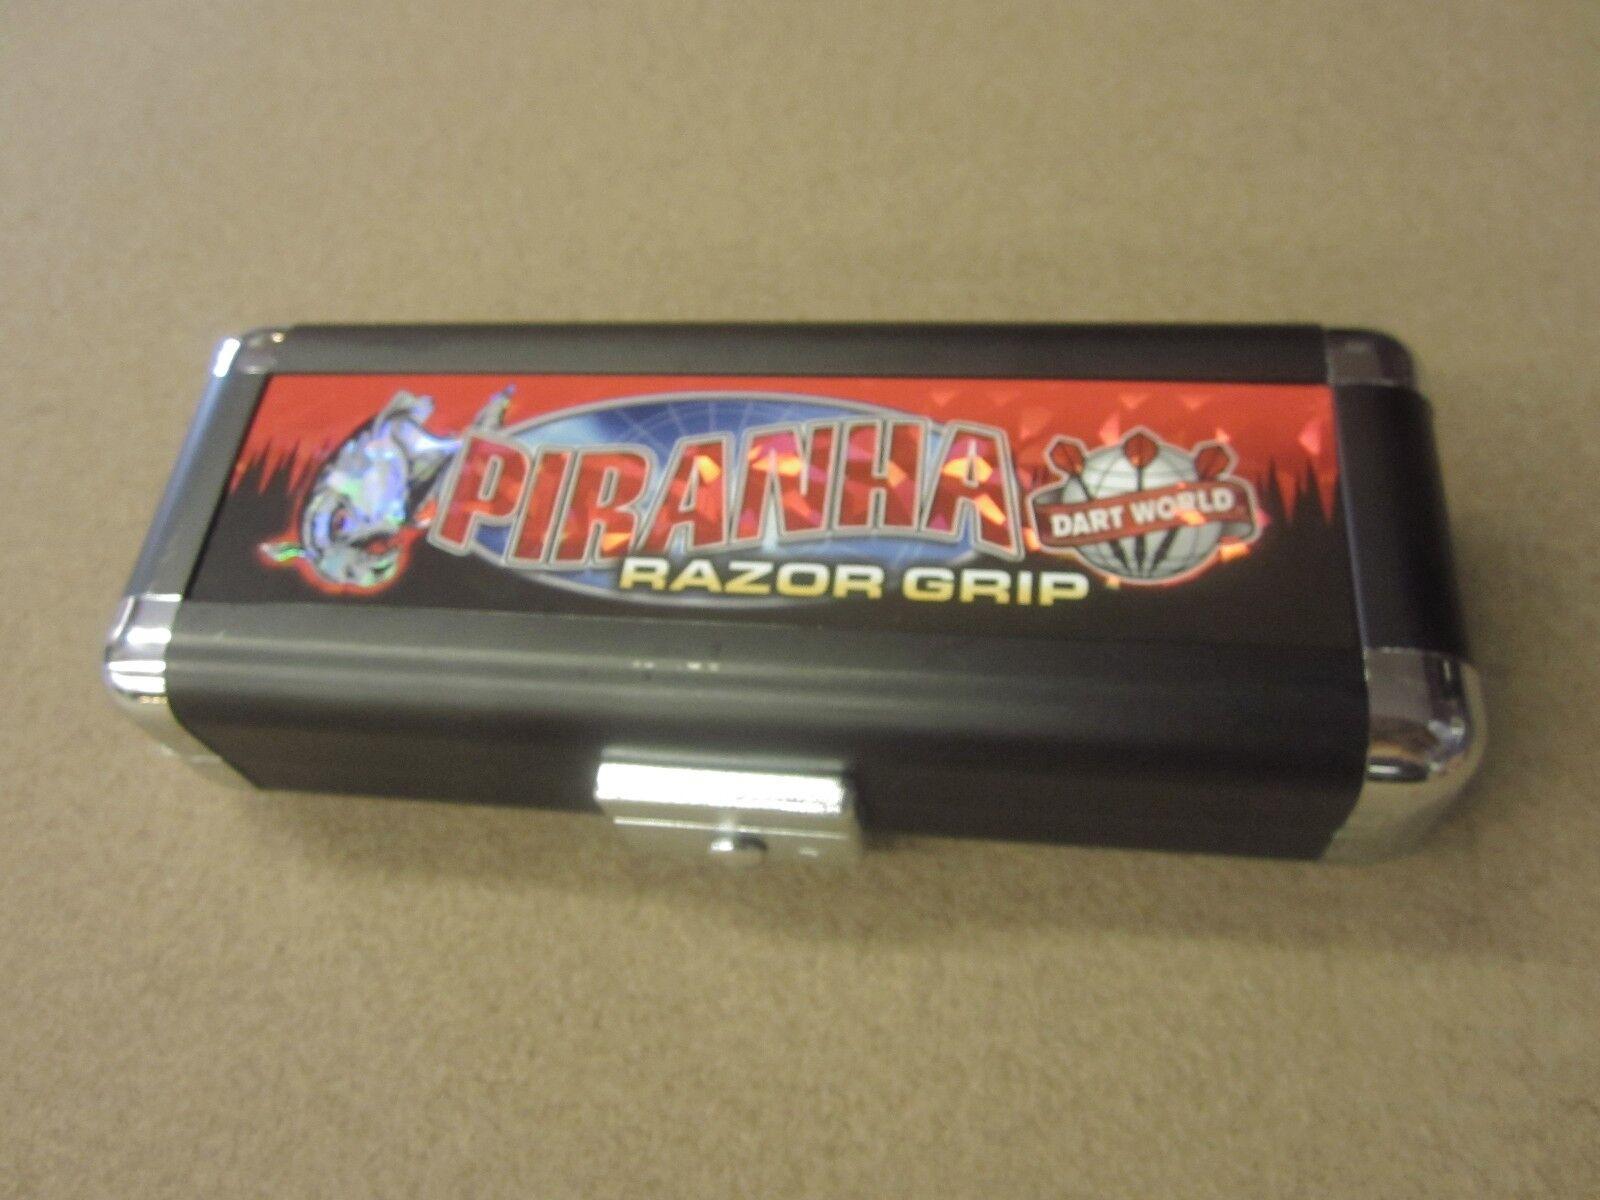 Piranha Razor Darts Grip 26g Steel Tip Darts Razor 90% Tungsten 19517 w/ FREE Shipping e657ee